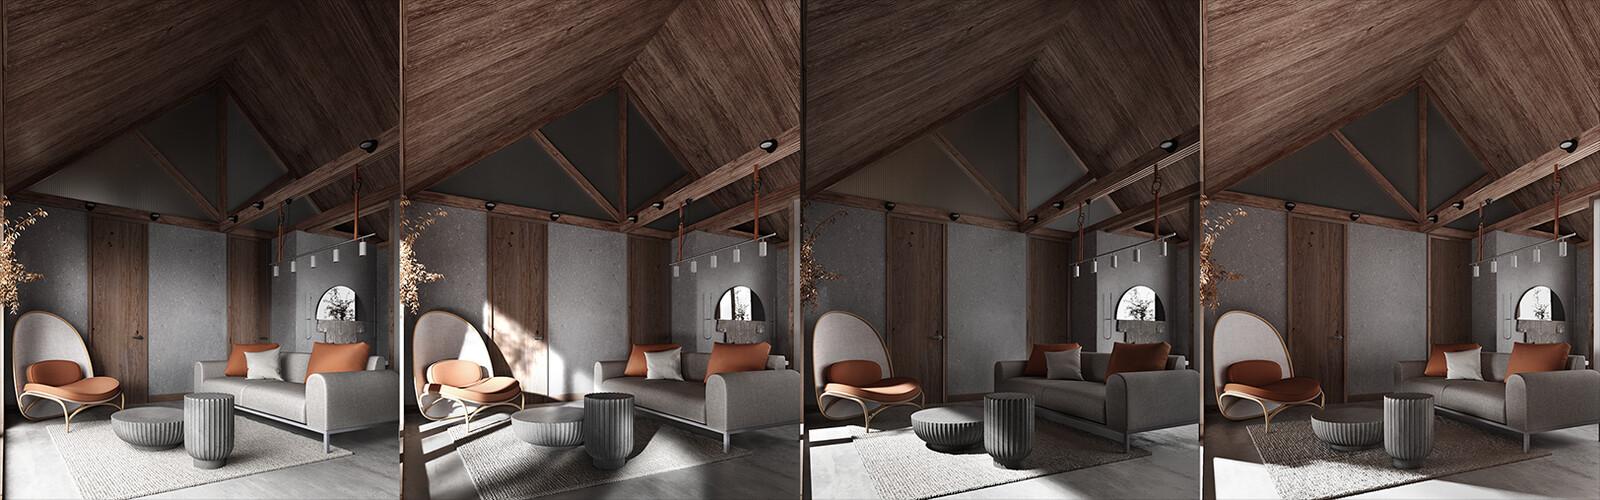 Interior light variations in color